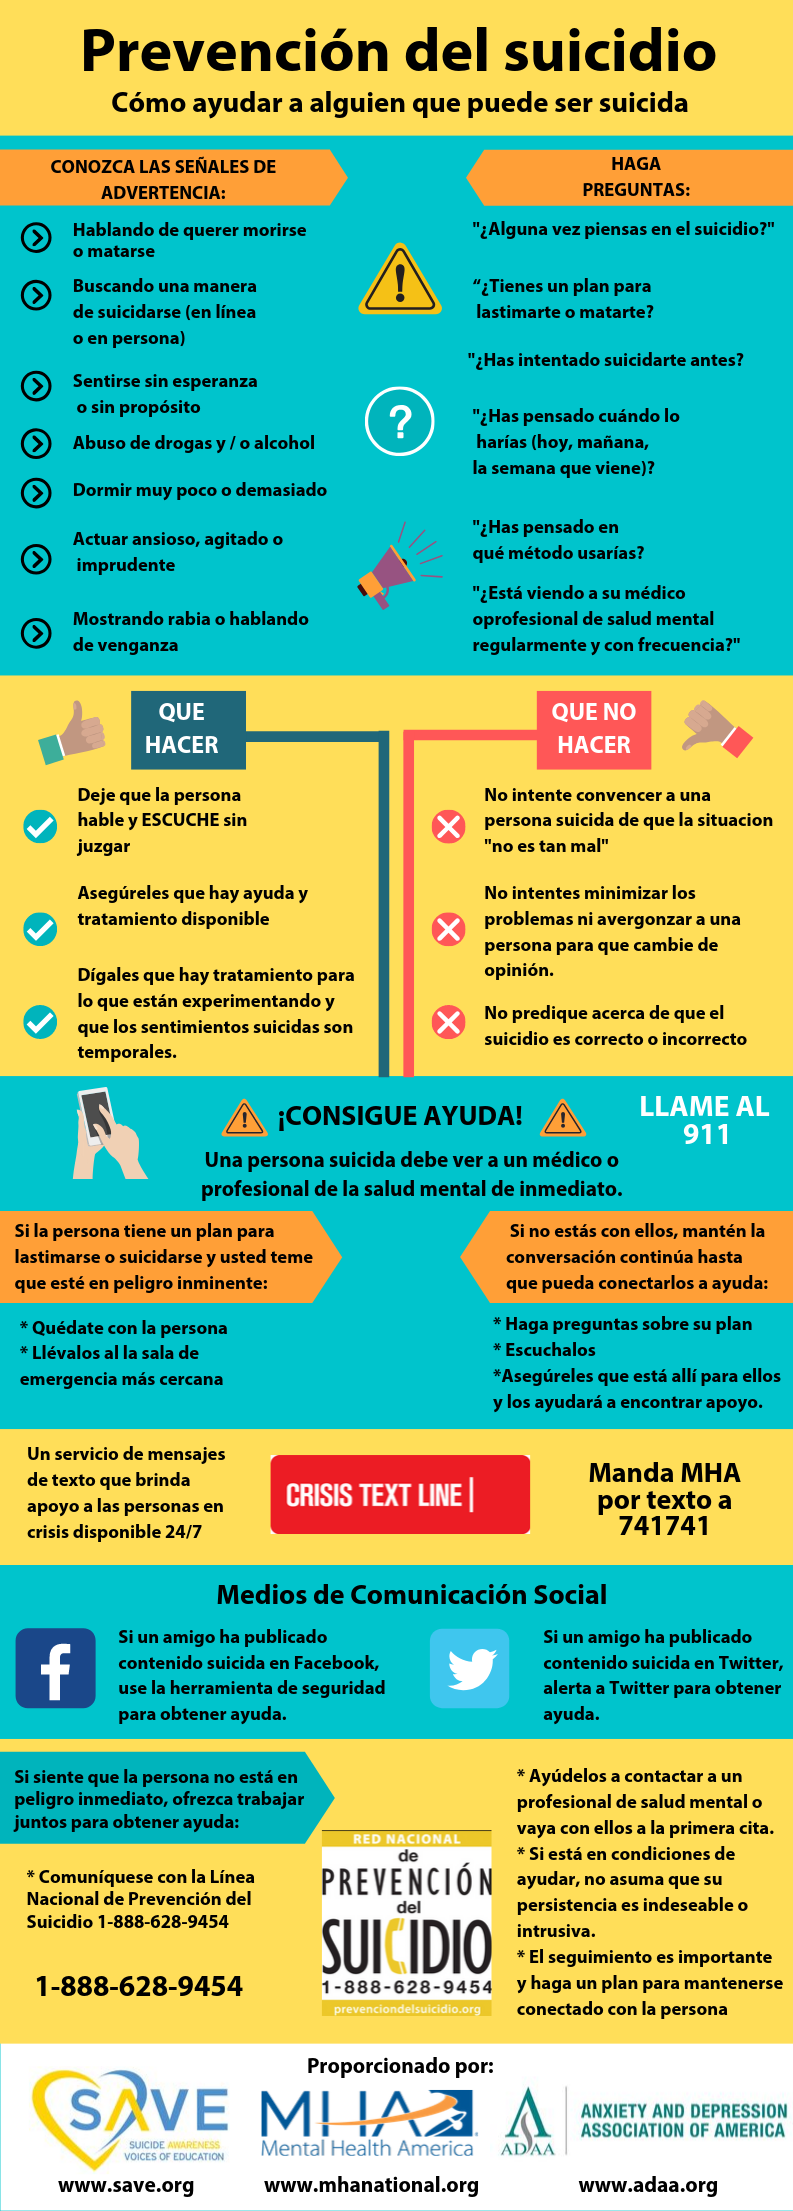 Recursos En Español | Anxiety and Depression Association of America, ADAA